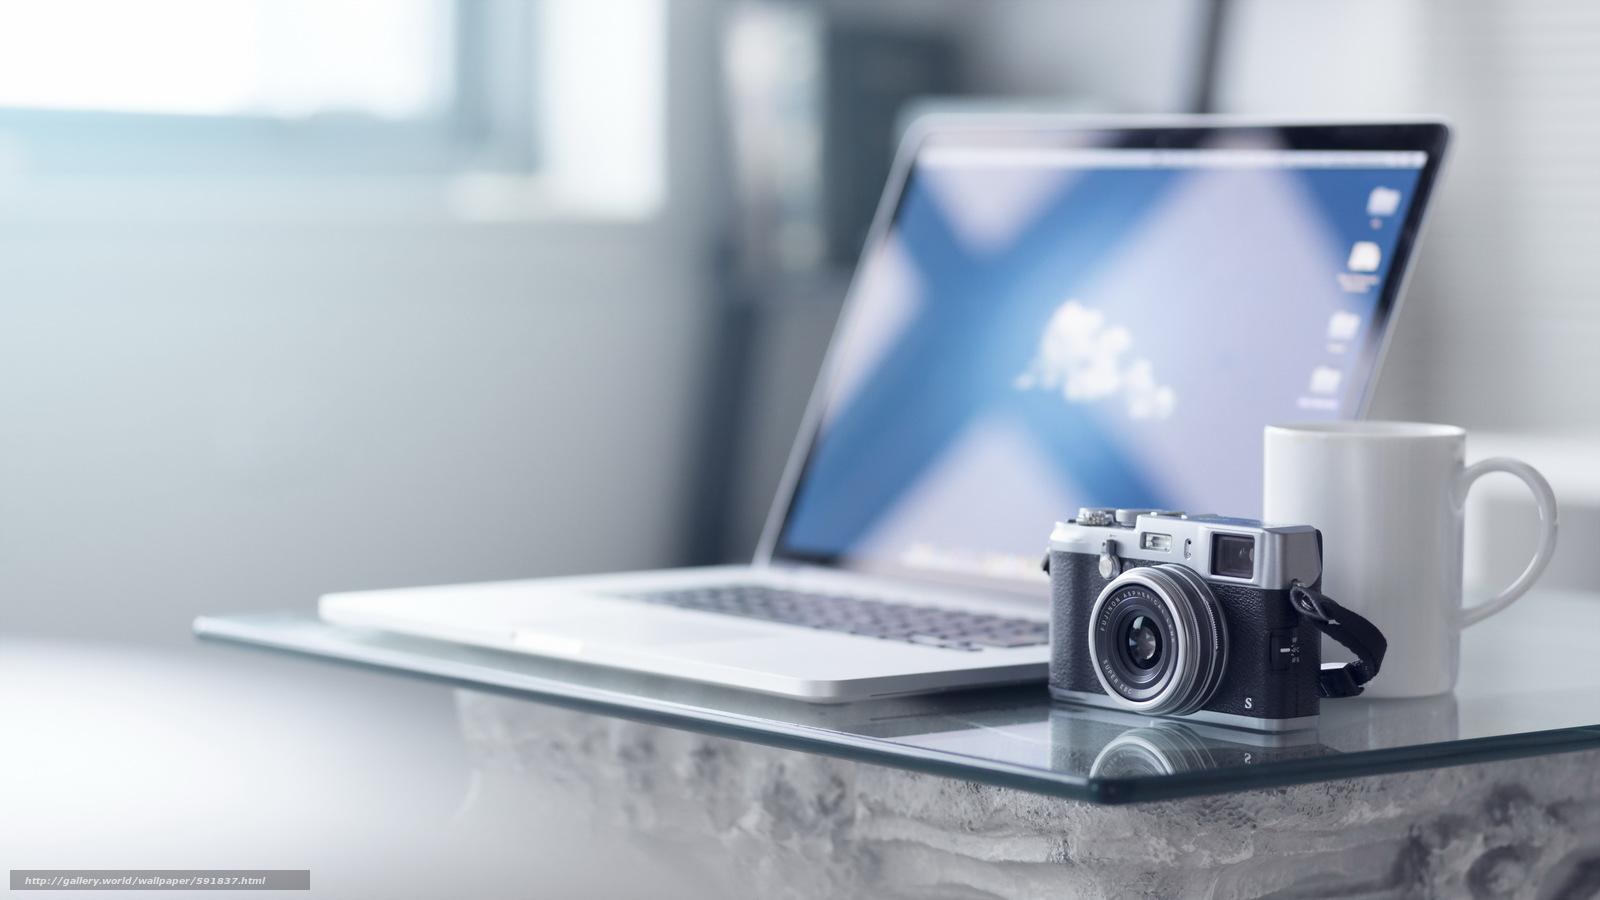 Download wallpaper Fuji X100S,  camera,  background free desktop wallpaper in the resolution 2560x1440 — picture №591837